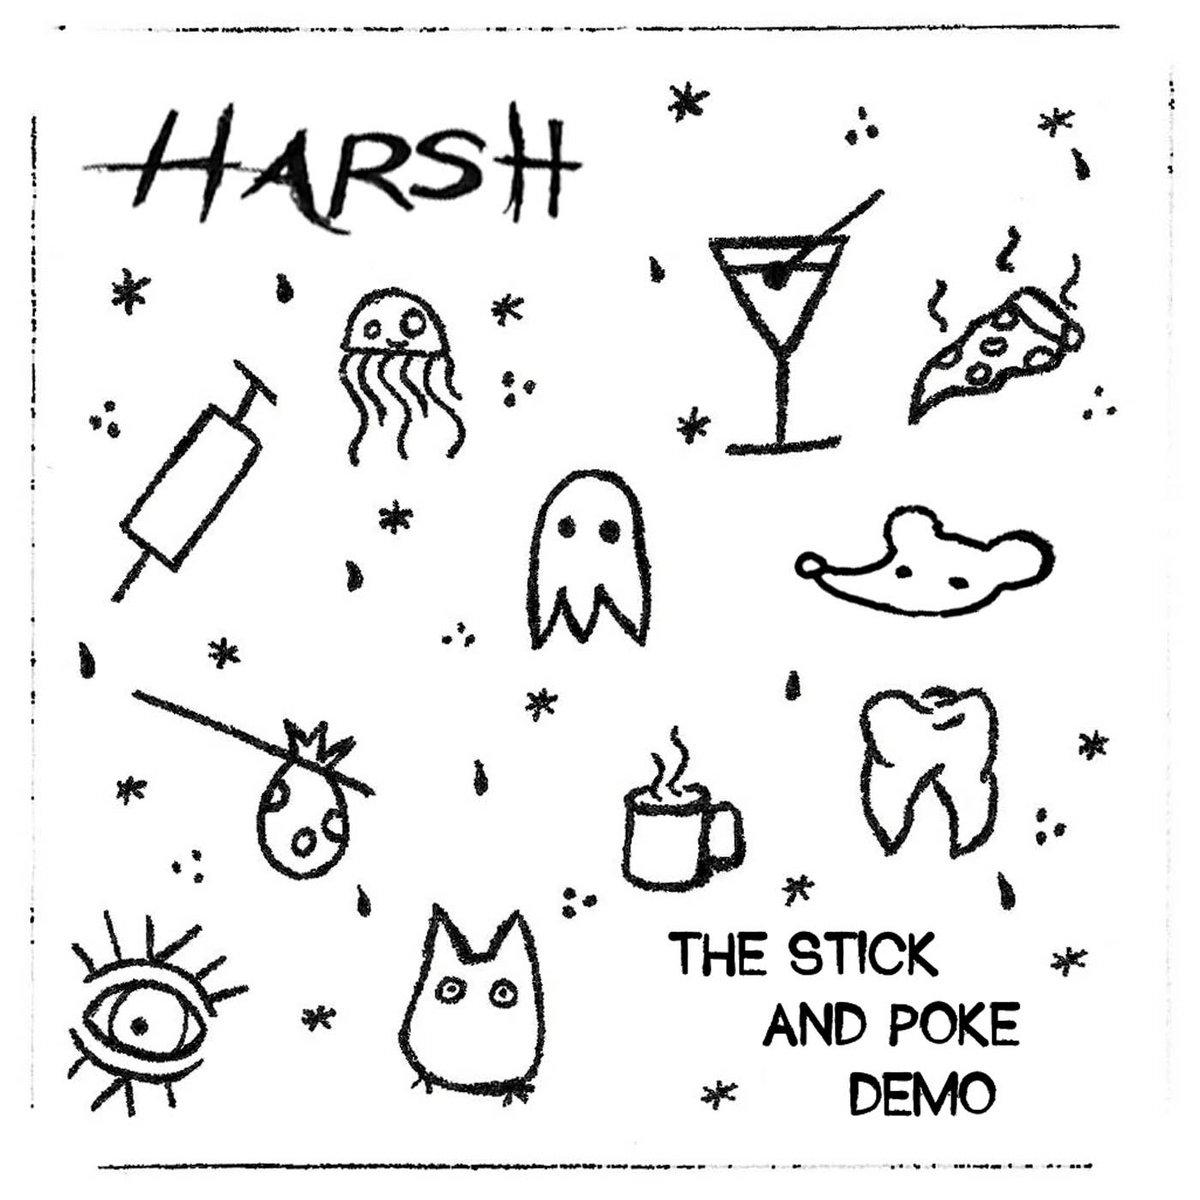 The Stick And Poke Demo